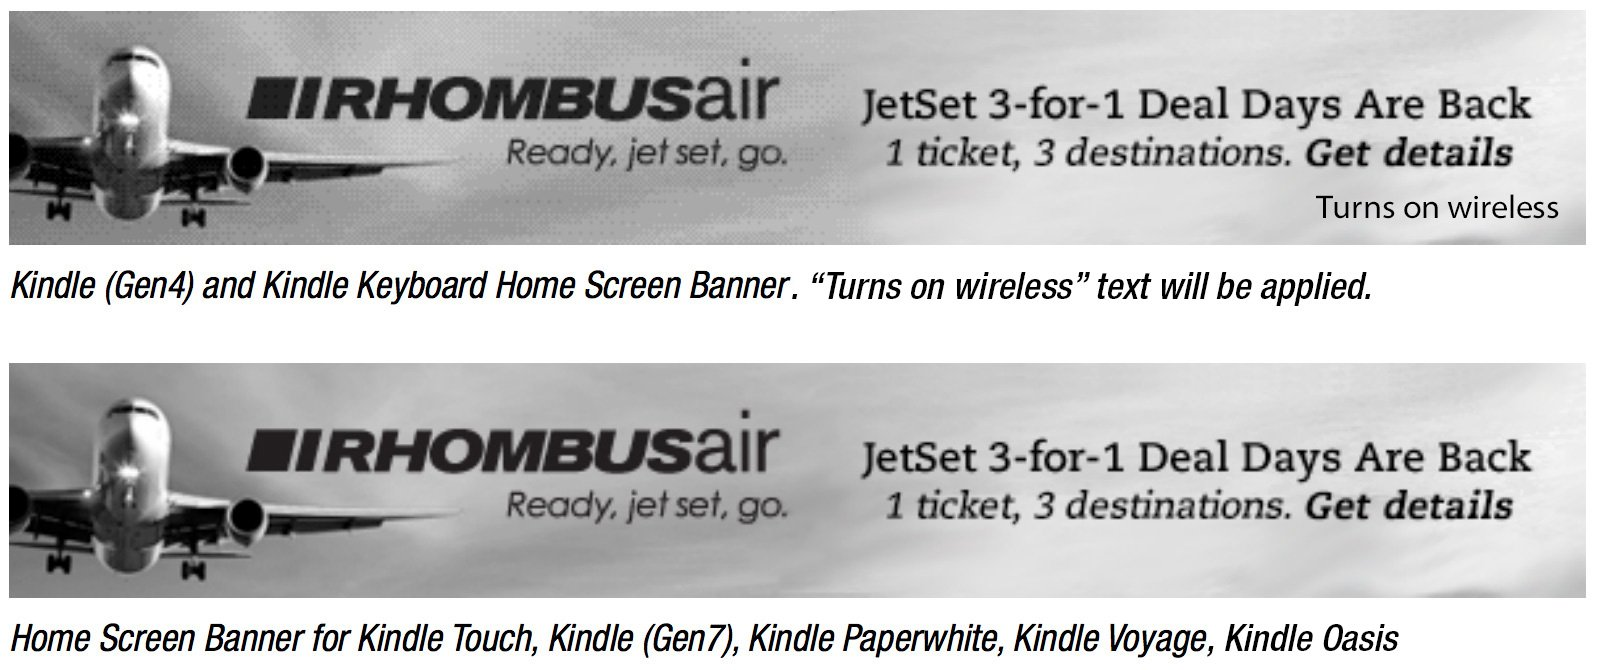 Kindle Home Screen Banners CTA and